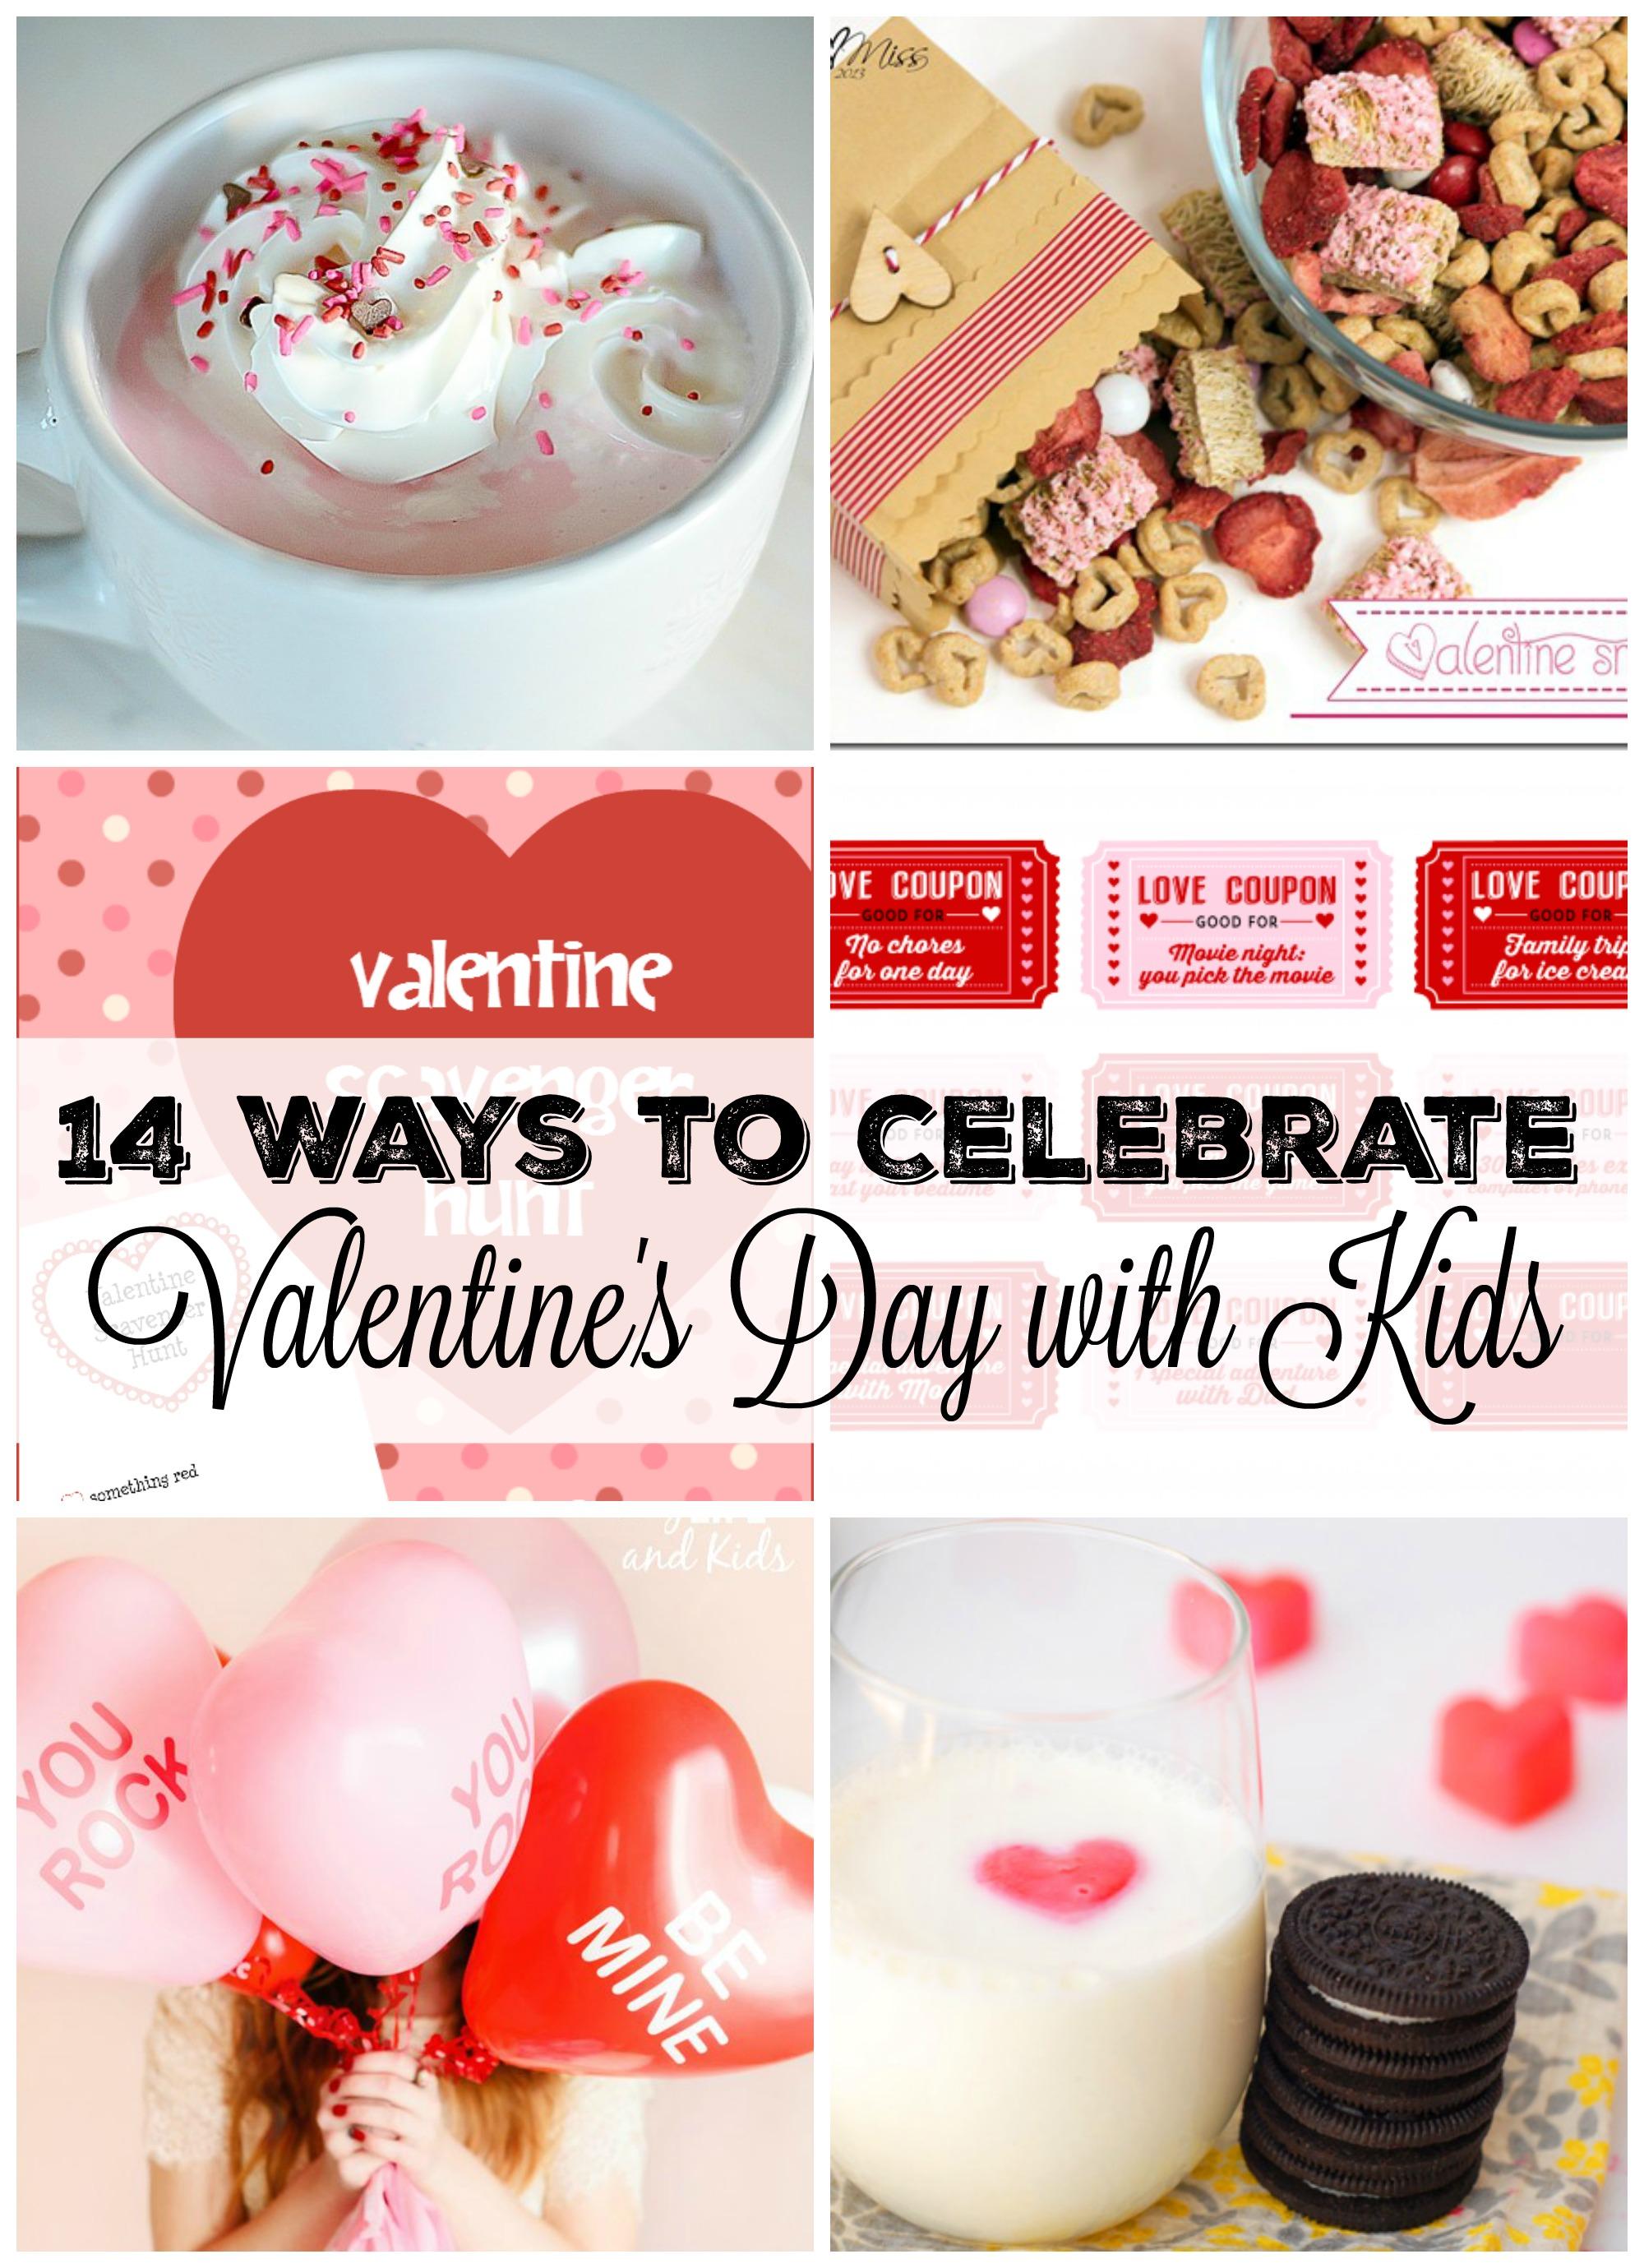 14 ways to celebrate valentines day with kids - Valentines Day With Kids